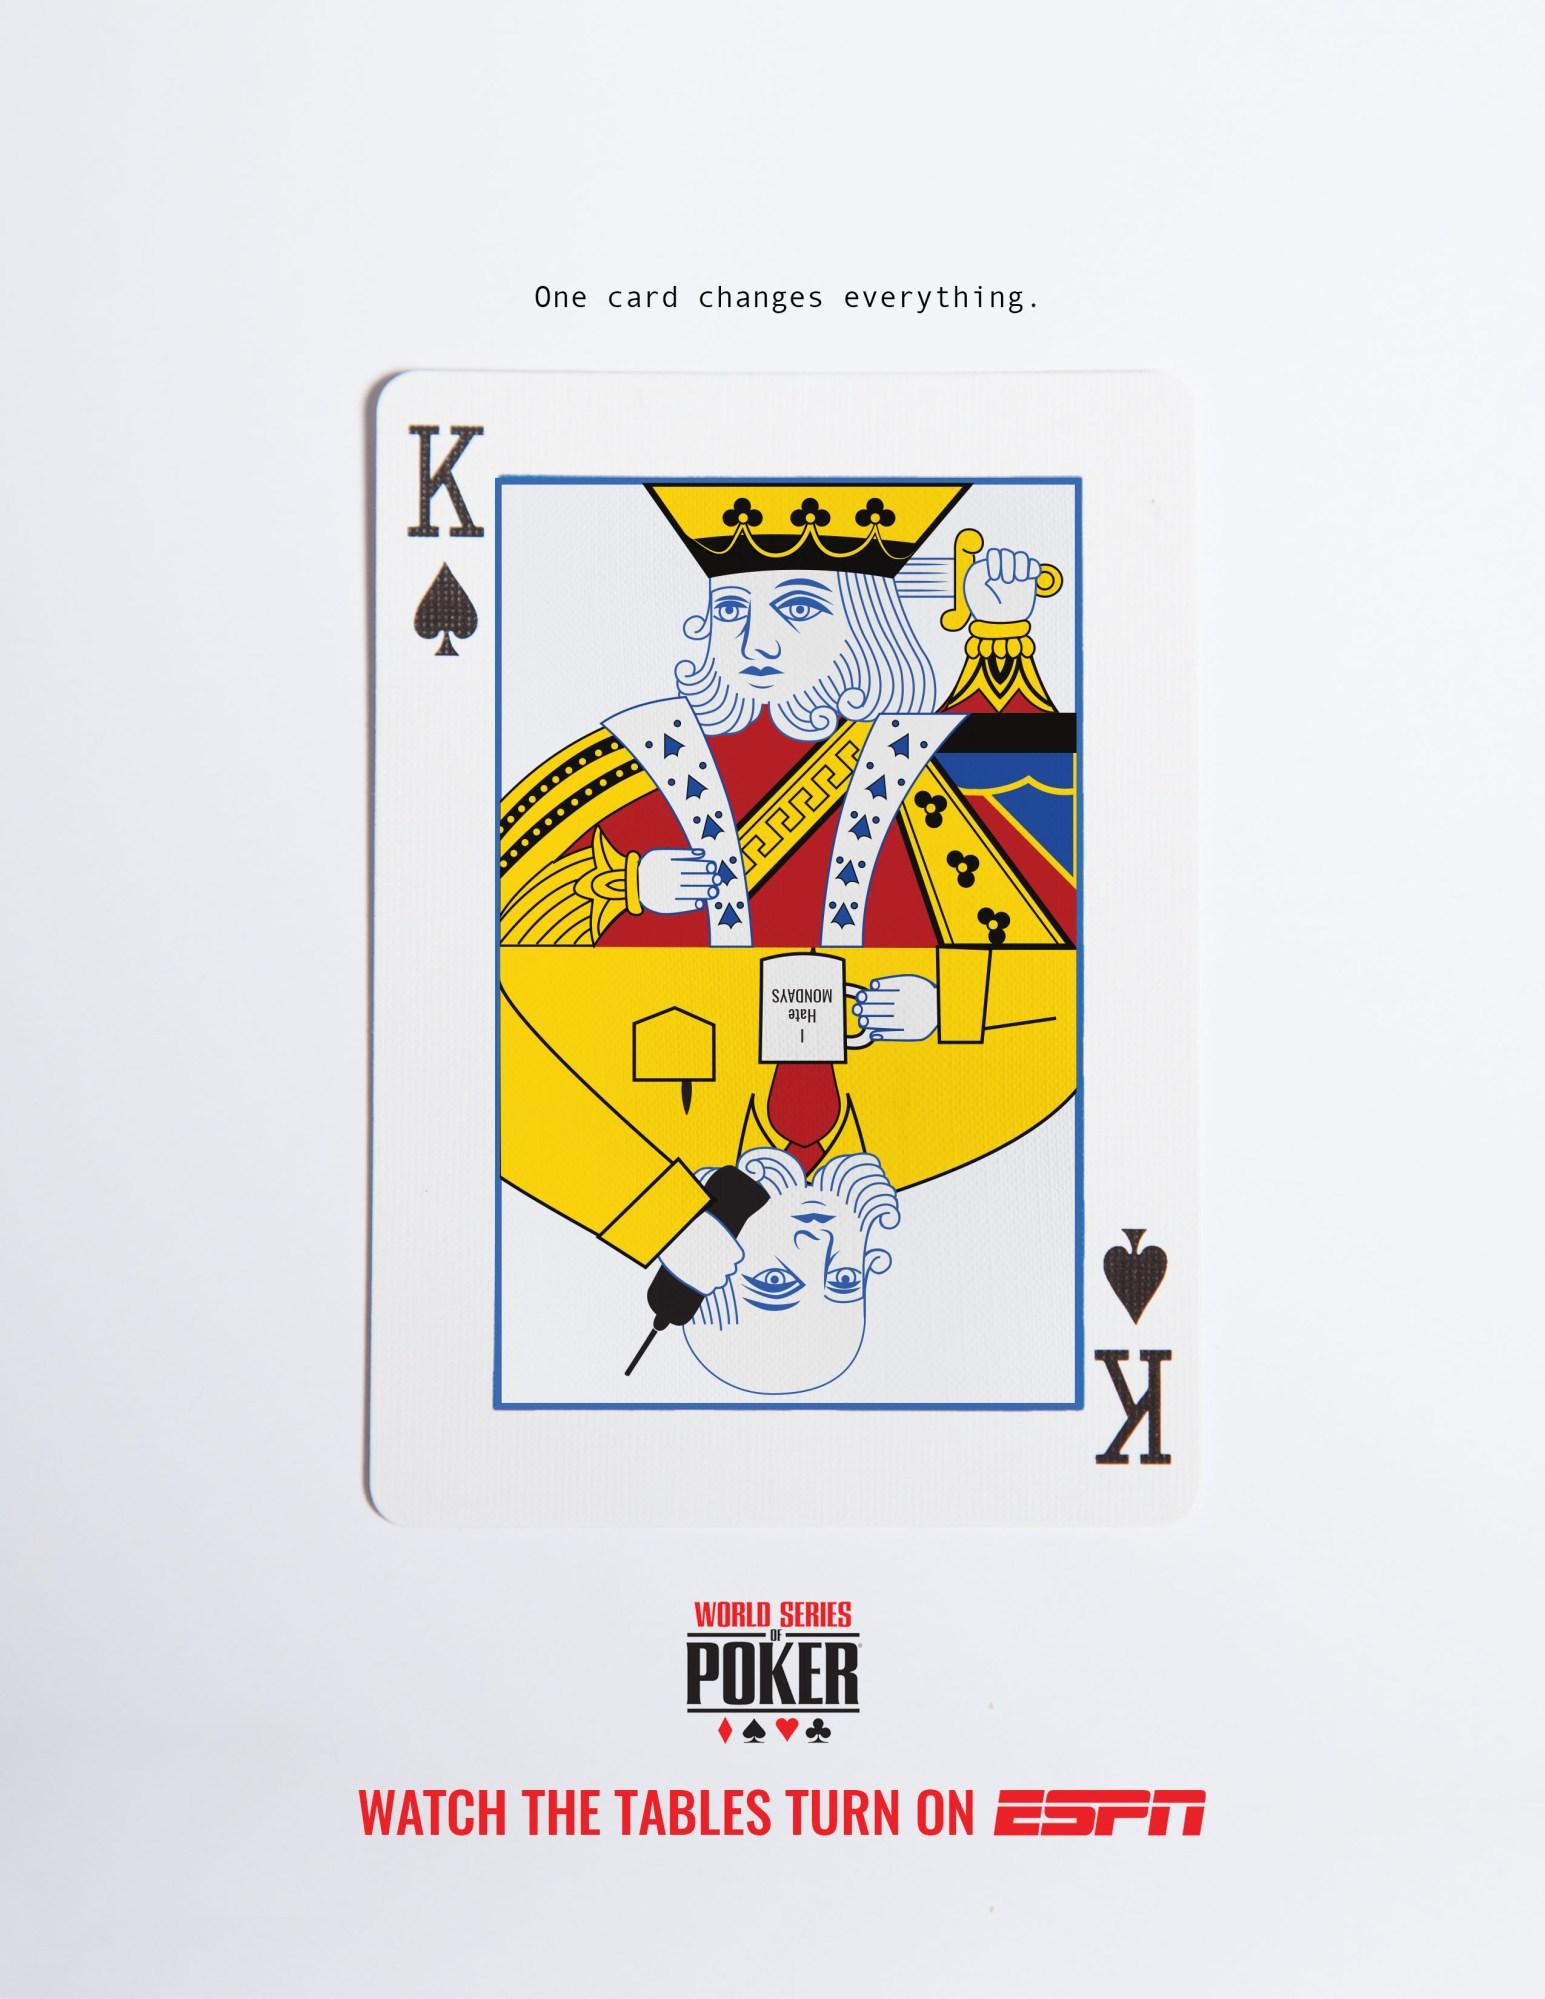 Poker_King_Final2.jpg